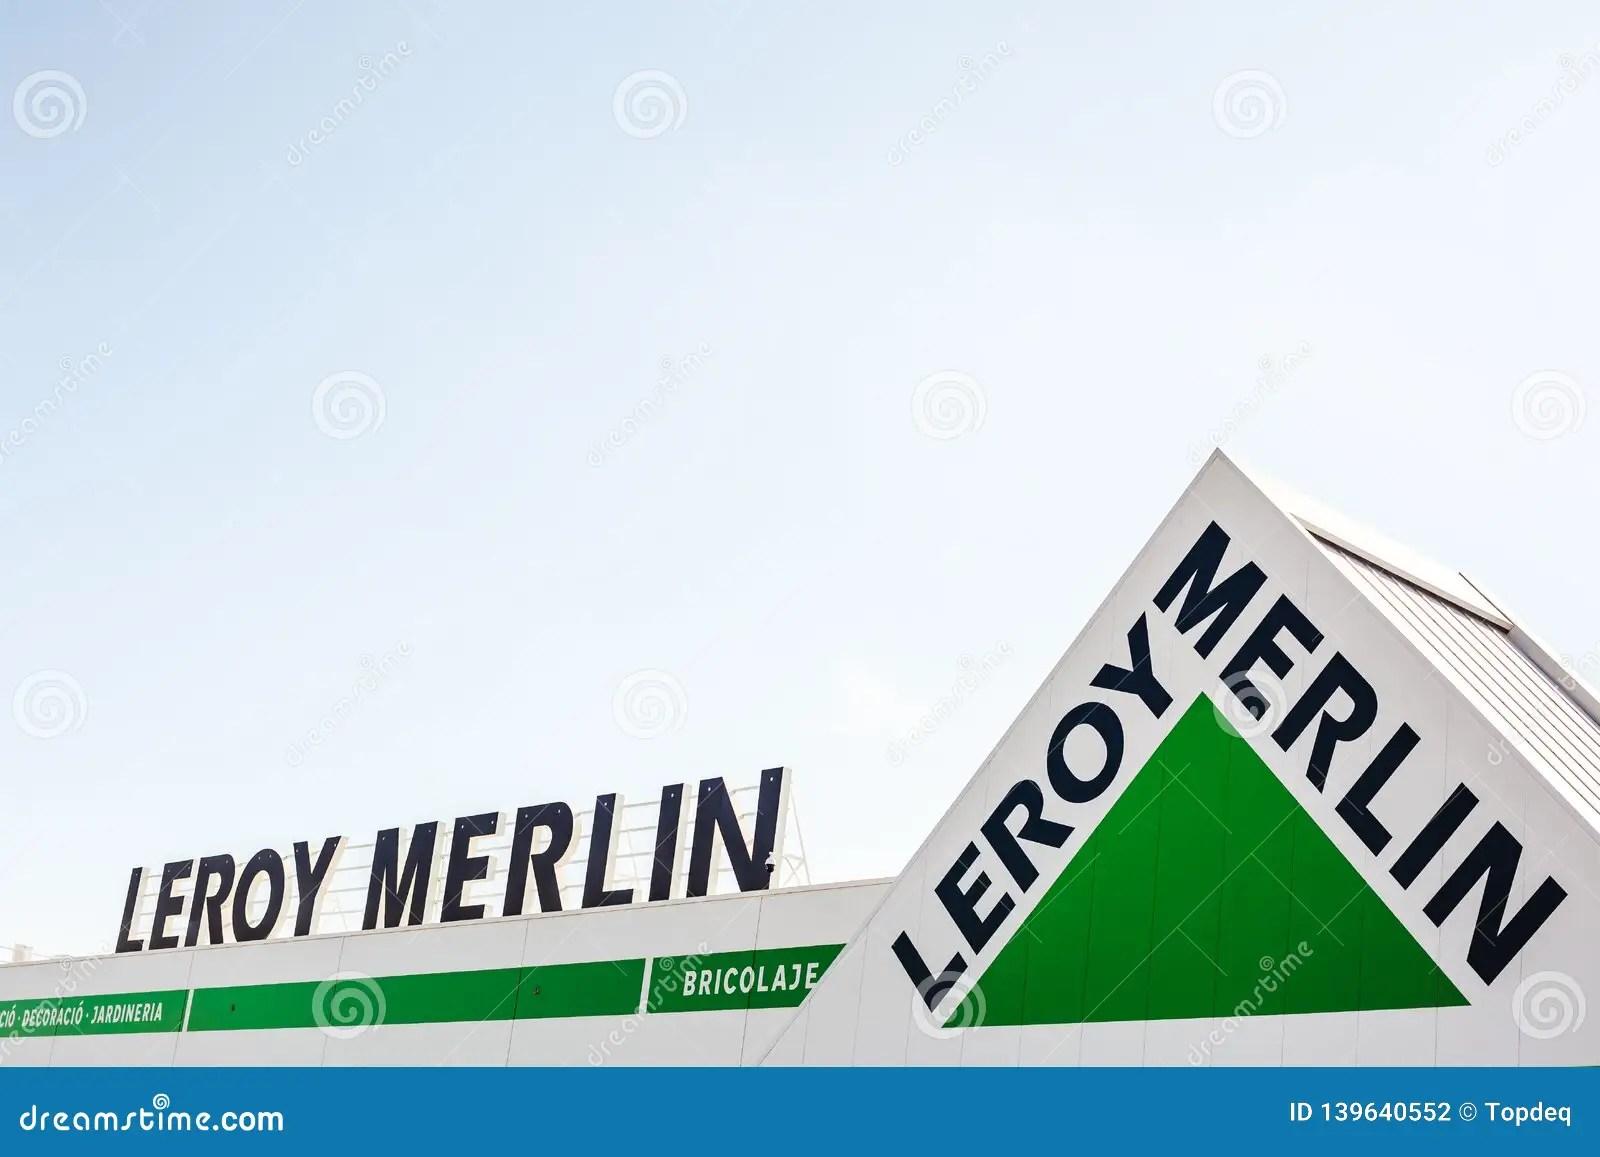 Leroy Merlin Speicherketten Markenlogo Stockfoto Bild Von Speicherketten Markenlogo 139640552